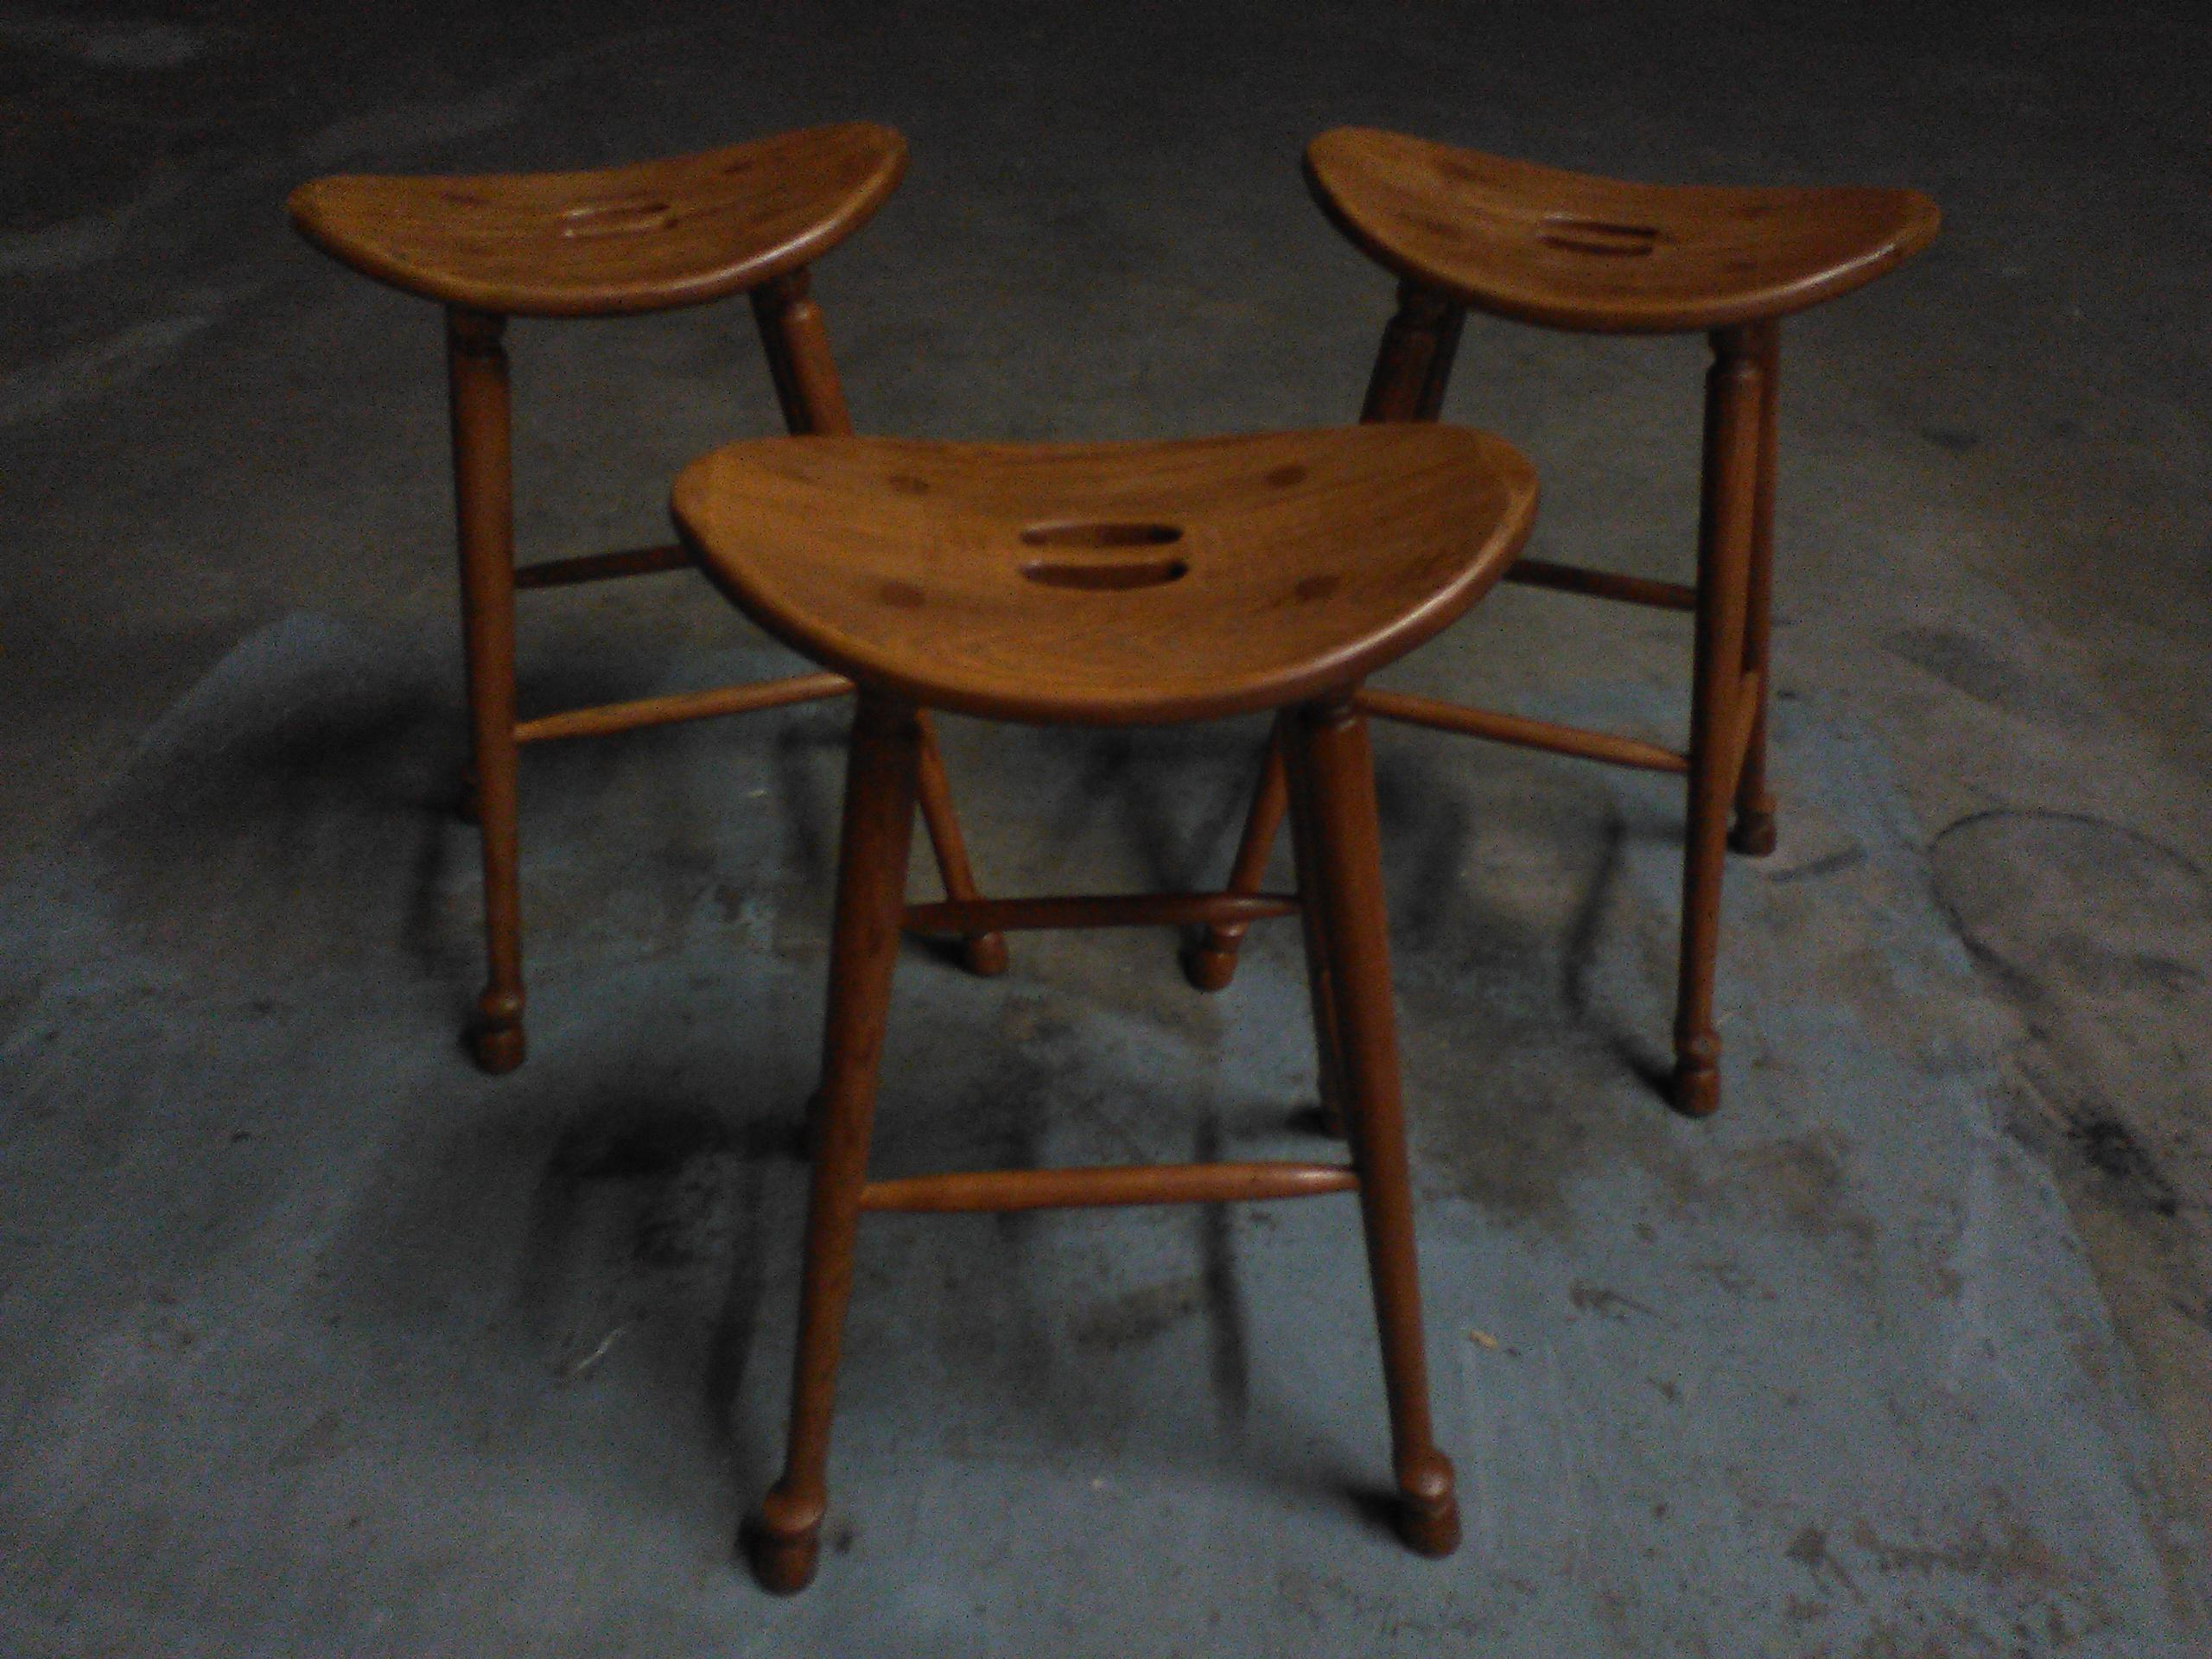 Saddle Seat Bar Stools Set Of 3 Chairish